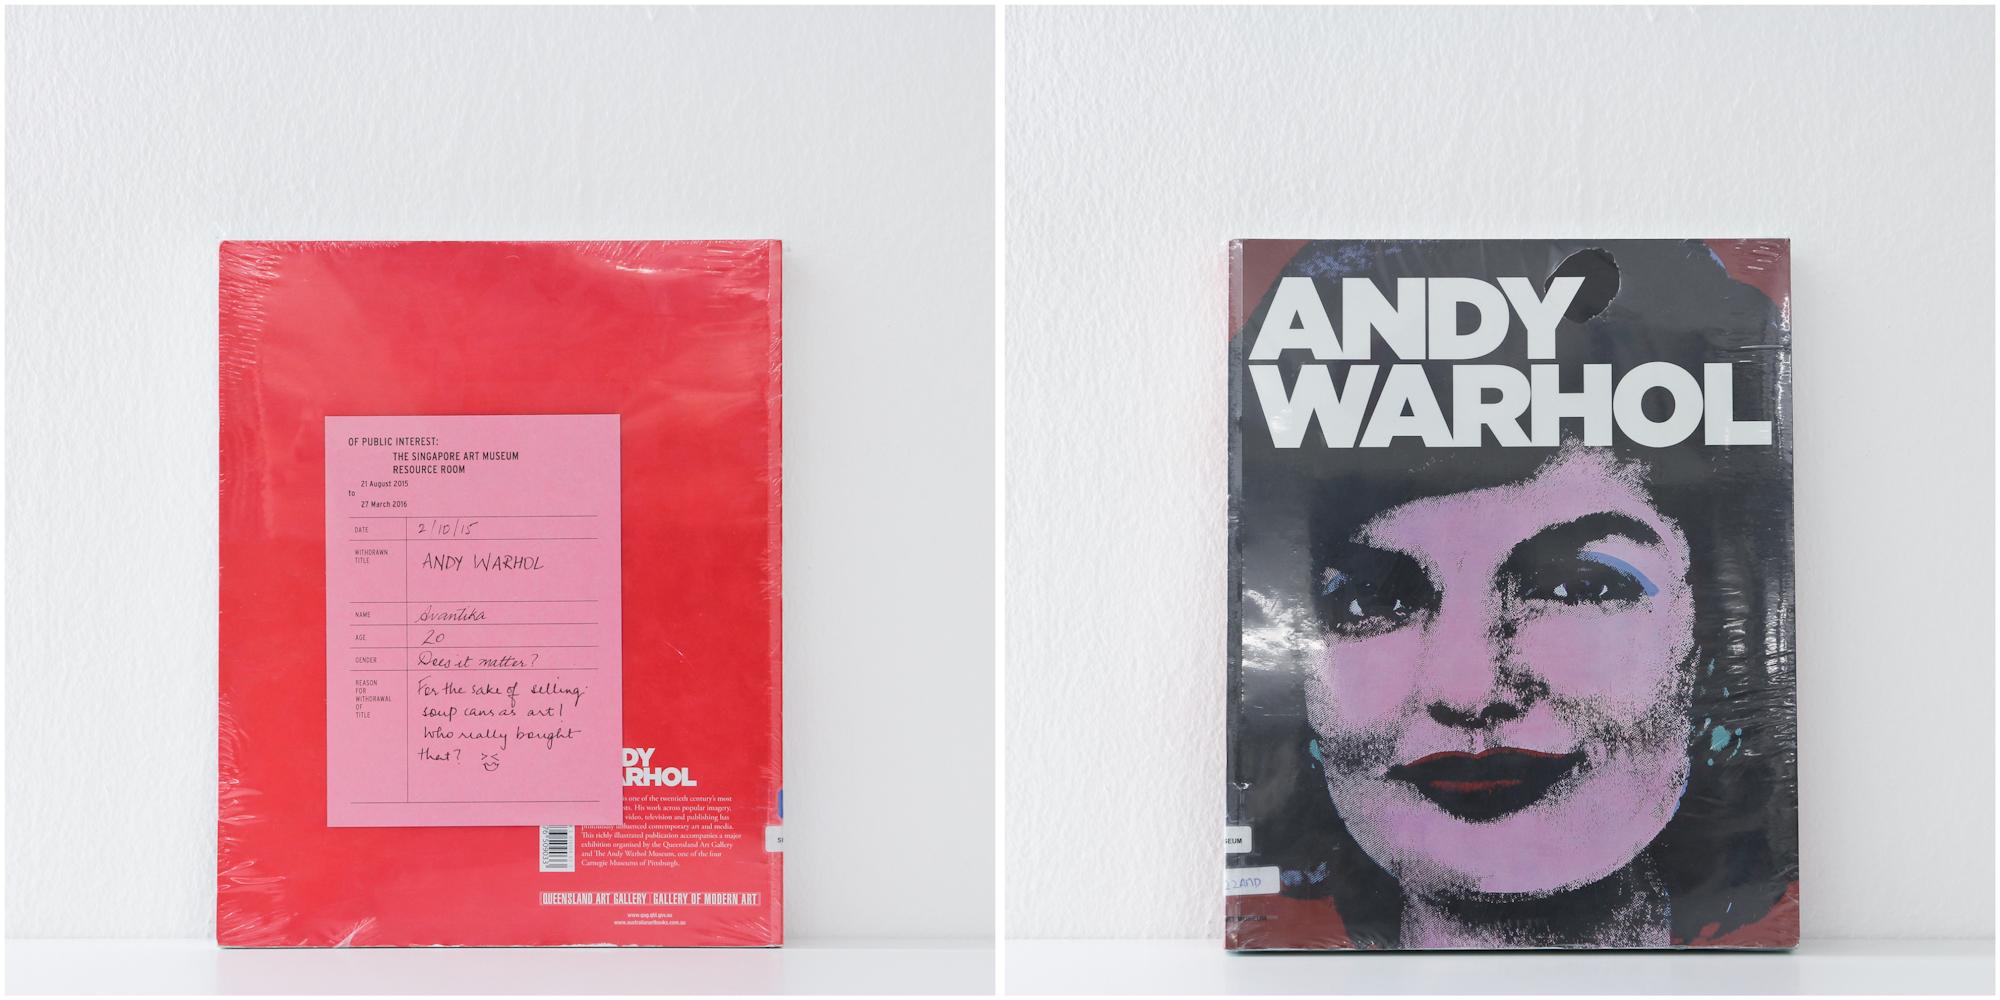 'Andy Warhol', 2/10/15, Avantika, 20, Female